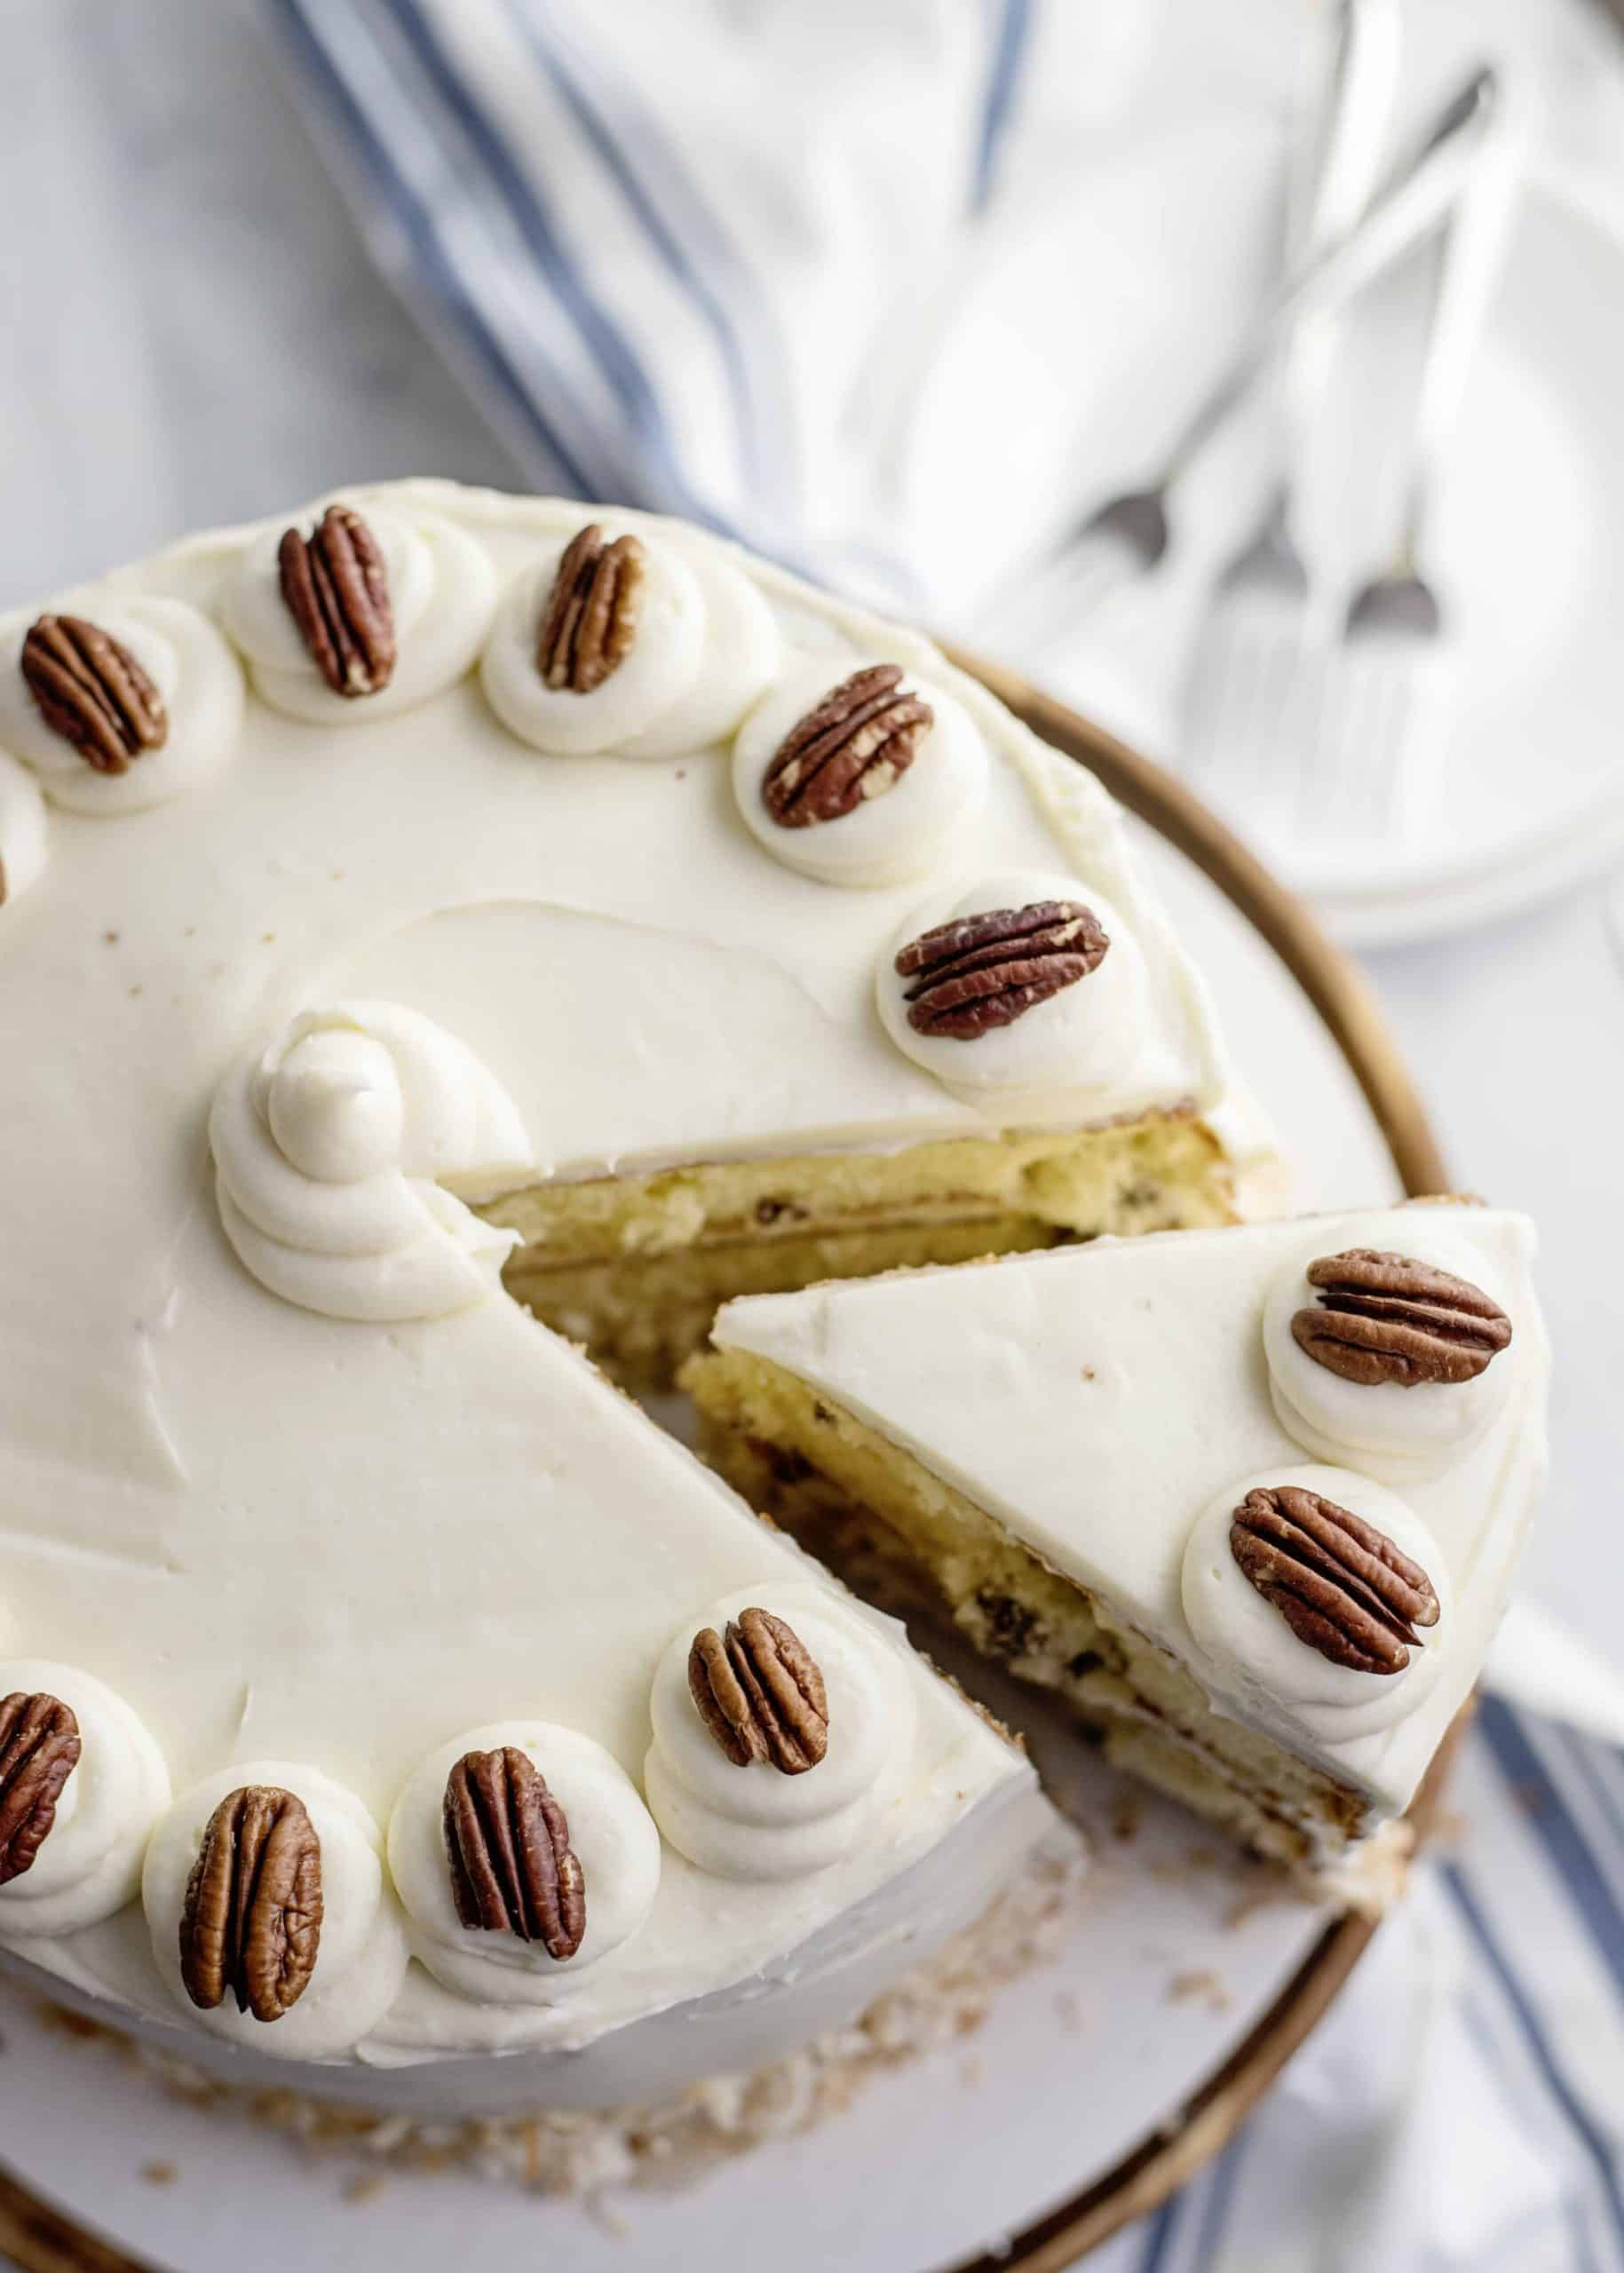 Slicing Italian Cream Cake